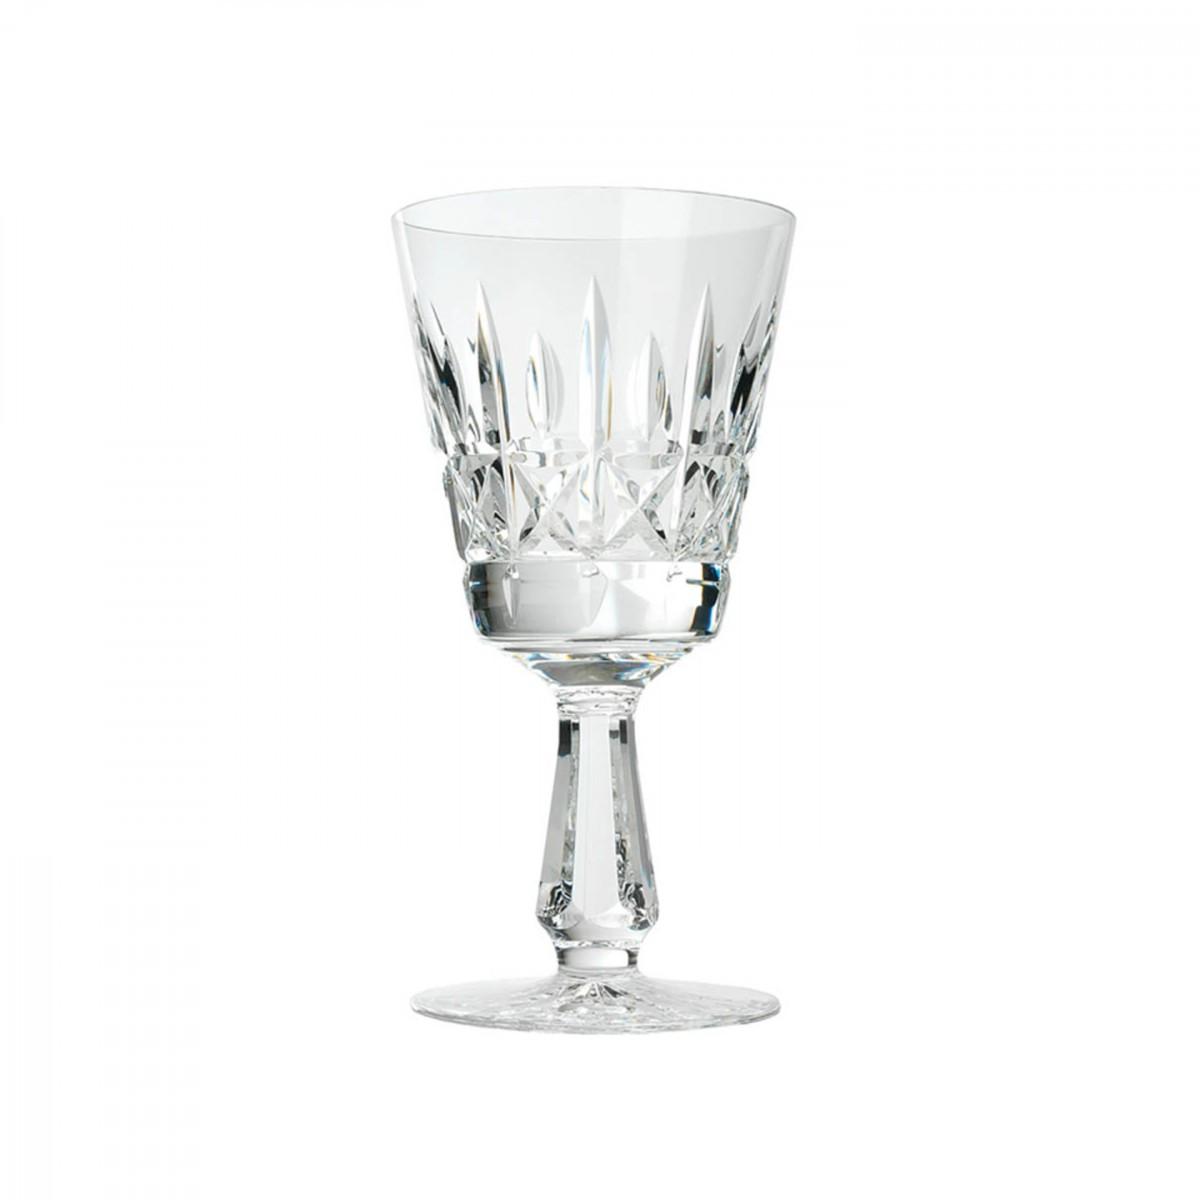 Retired Waterford Crystal Vase Patterns Of Kylemore Goblet Discontinued Waterford Us Pertaining to Kylemore Goblet Discontinued